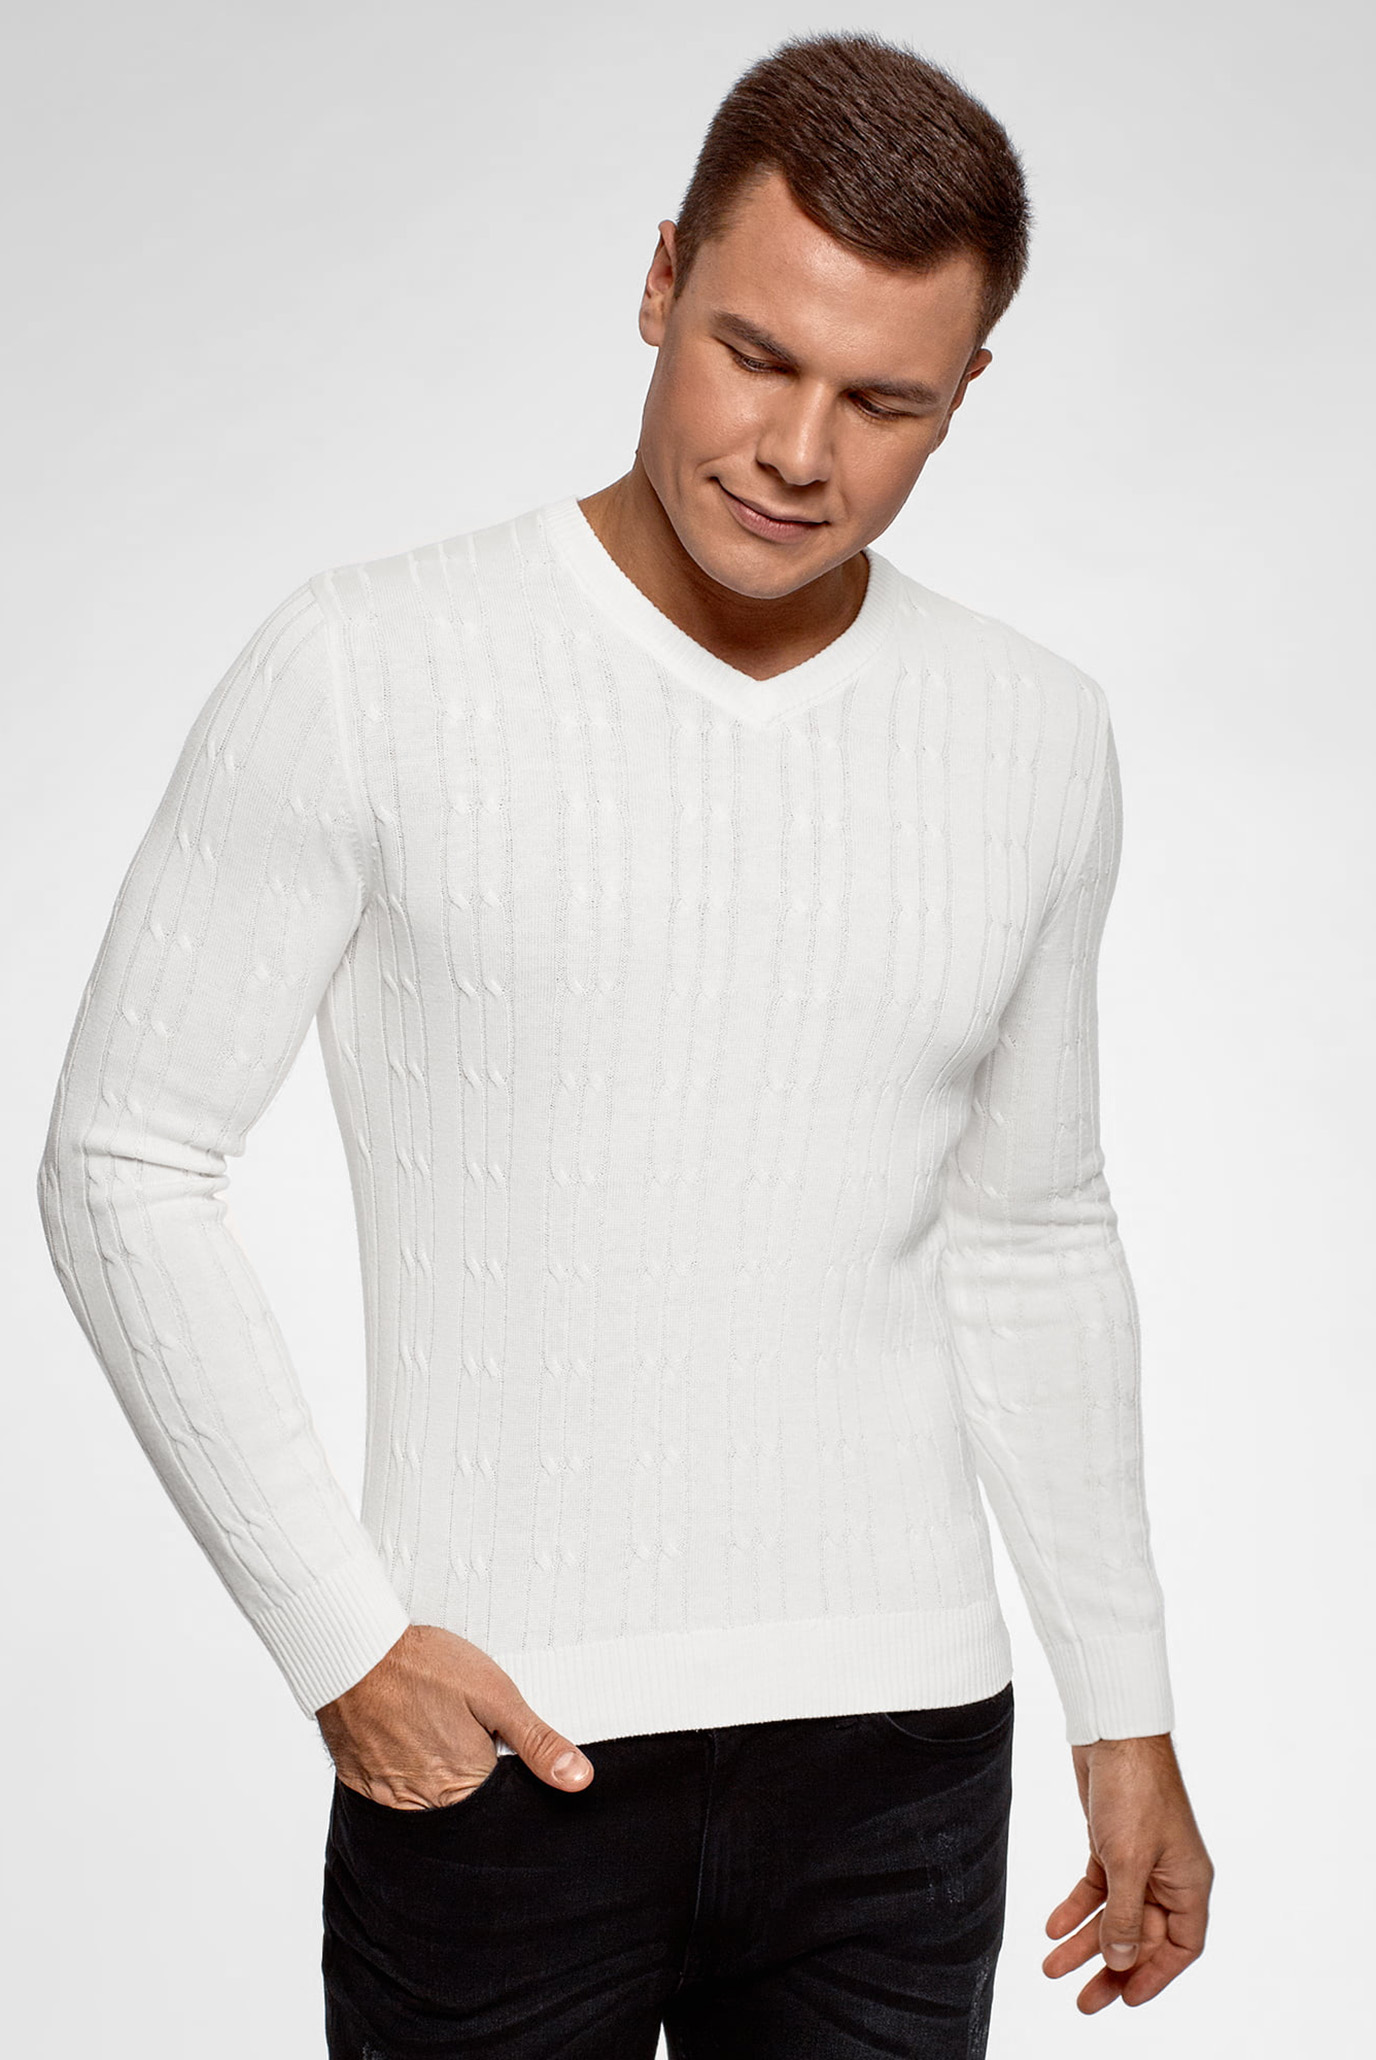 3357b4c59b924 Купить Мужской белый пуловер Oodji Oodji 4L212169M/25255N/1200N – Киев,  Украина. Цены в интернет магазине MD Fashion